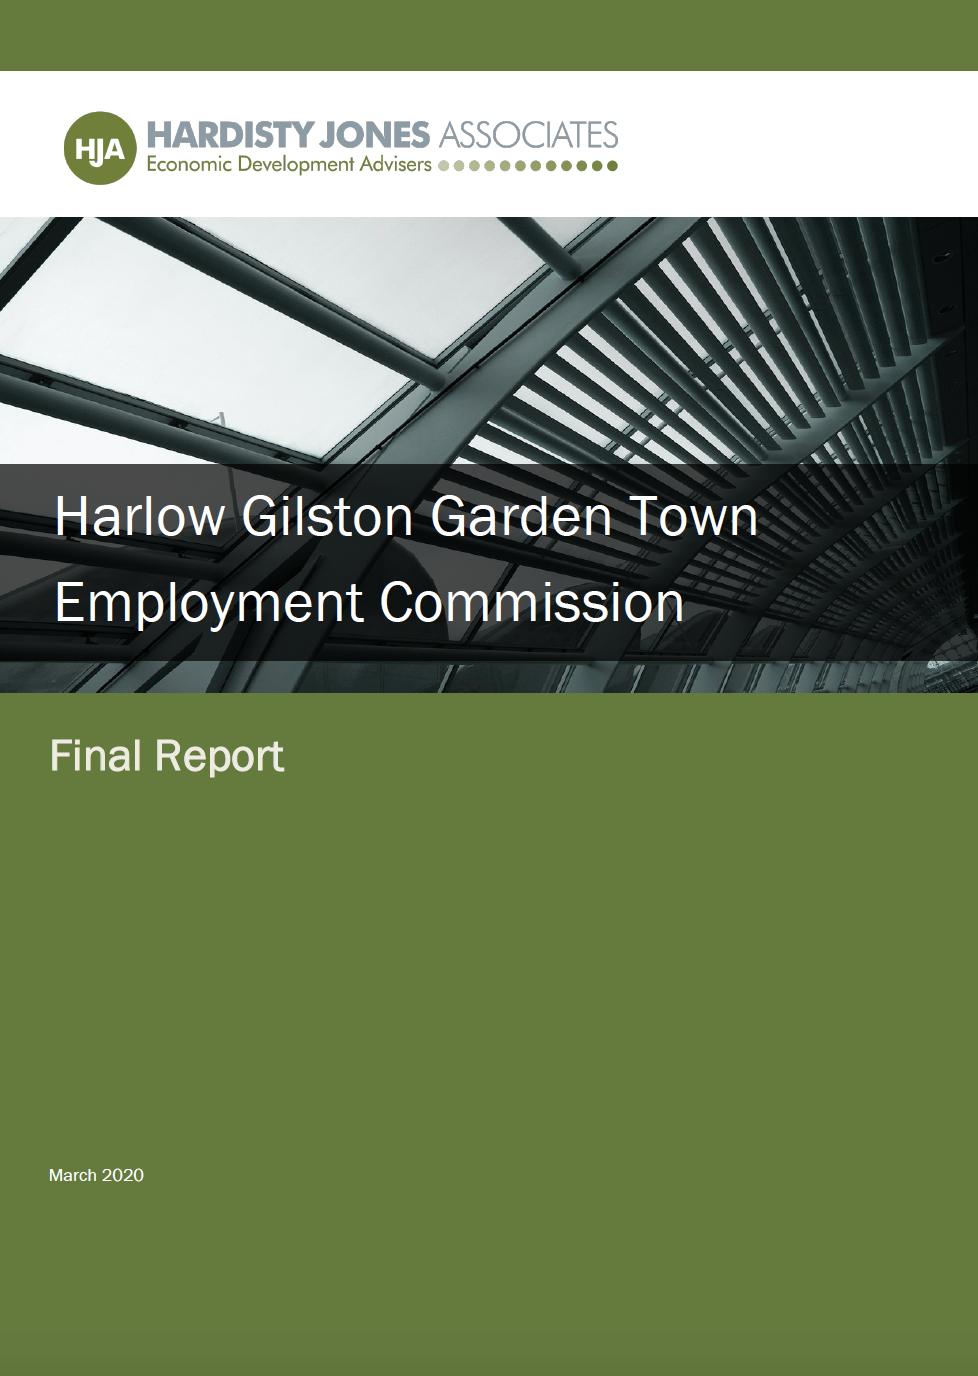 Employment Commission doc